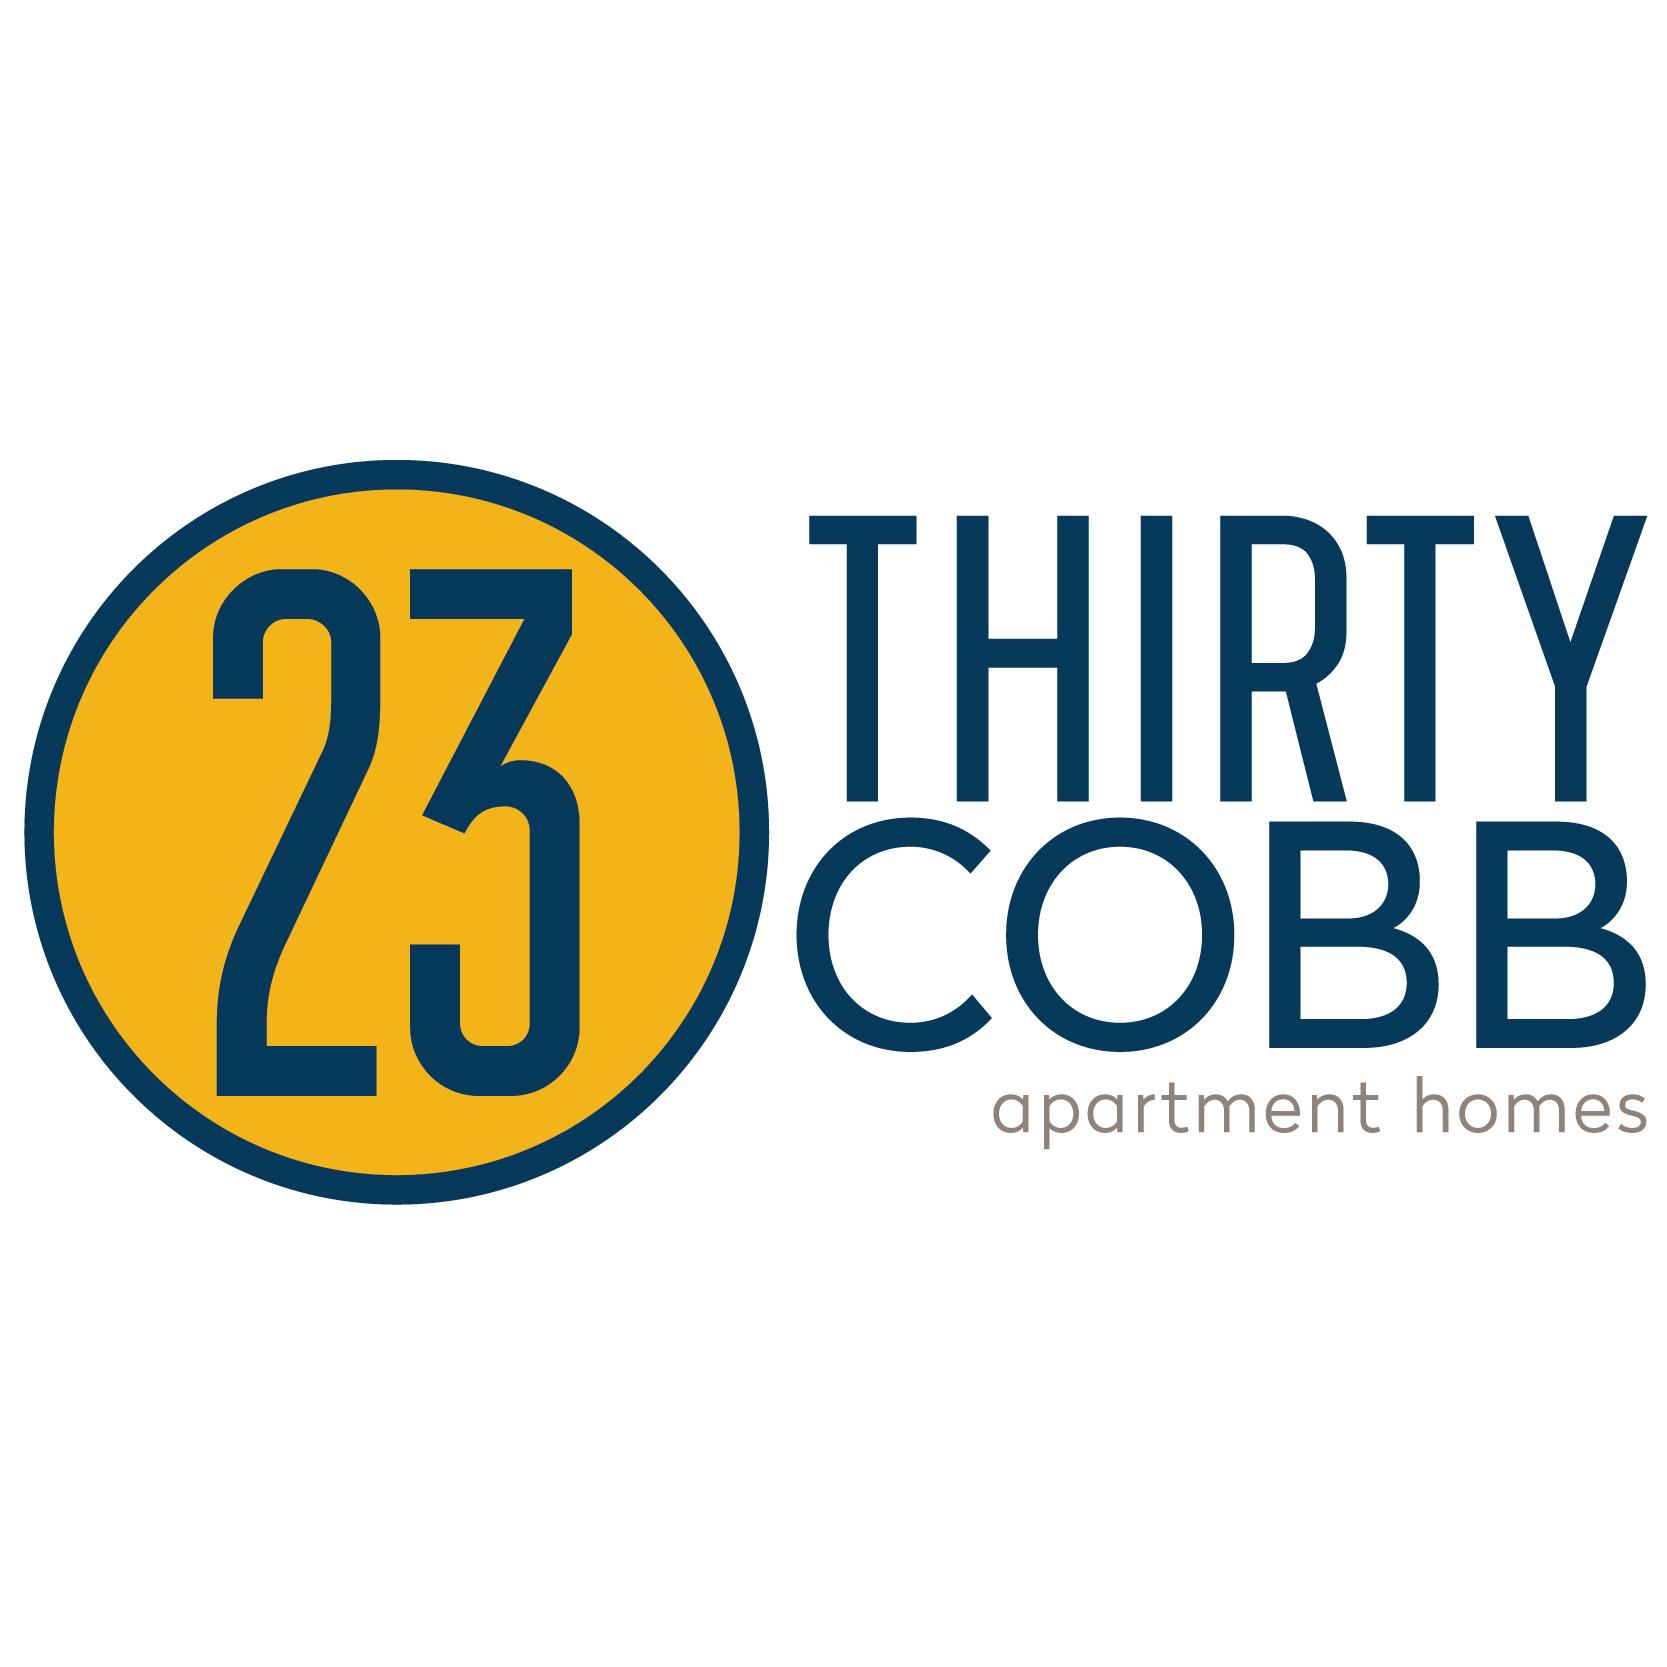 23Thirty Cobb Apartment Homes